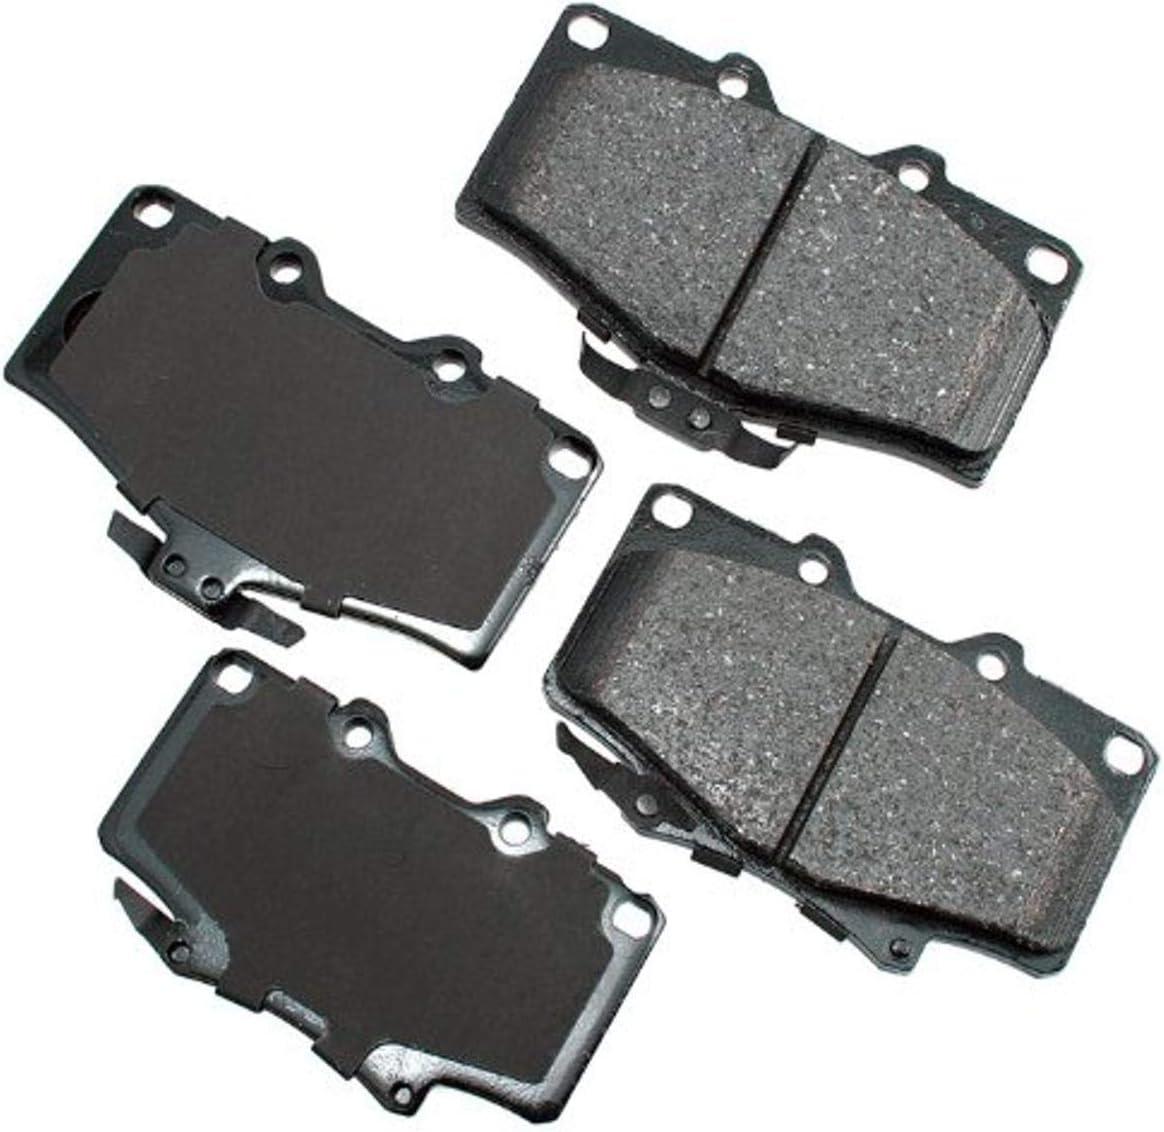 Akebono ACT502 Proact Ultra Premium Disc Great interest service Brake kit Ceramic Pad